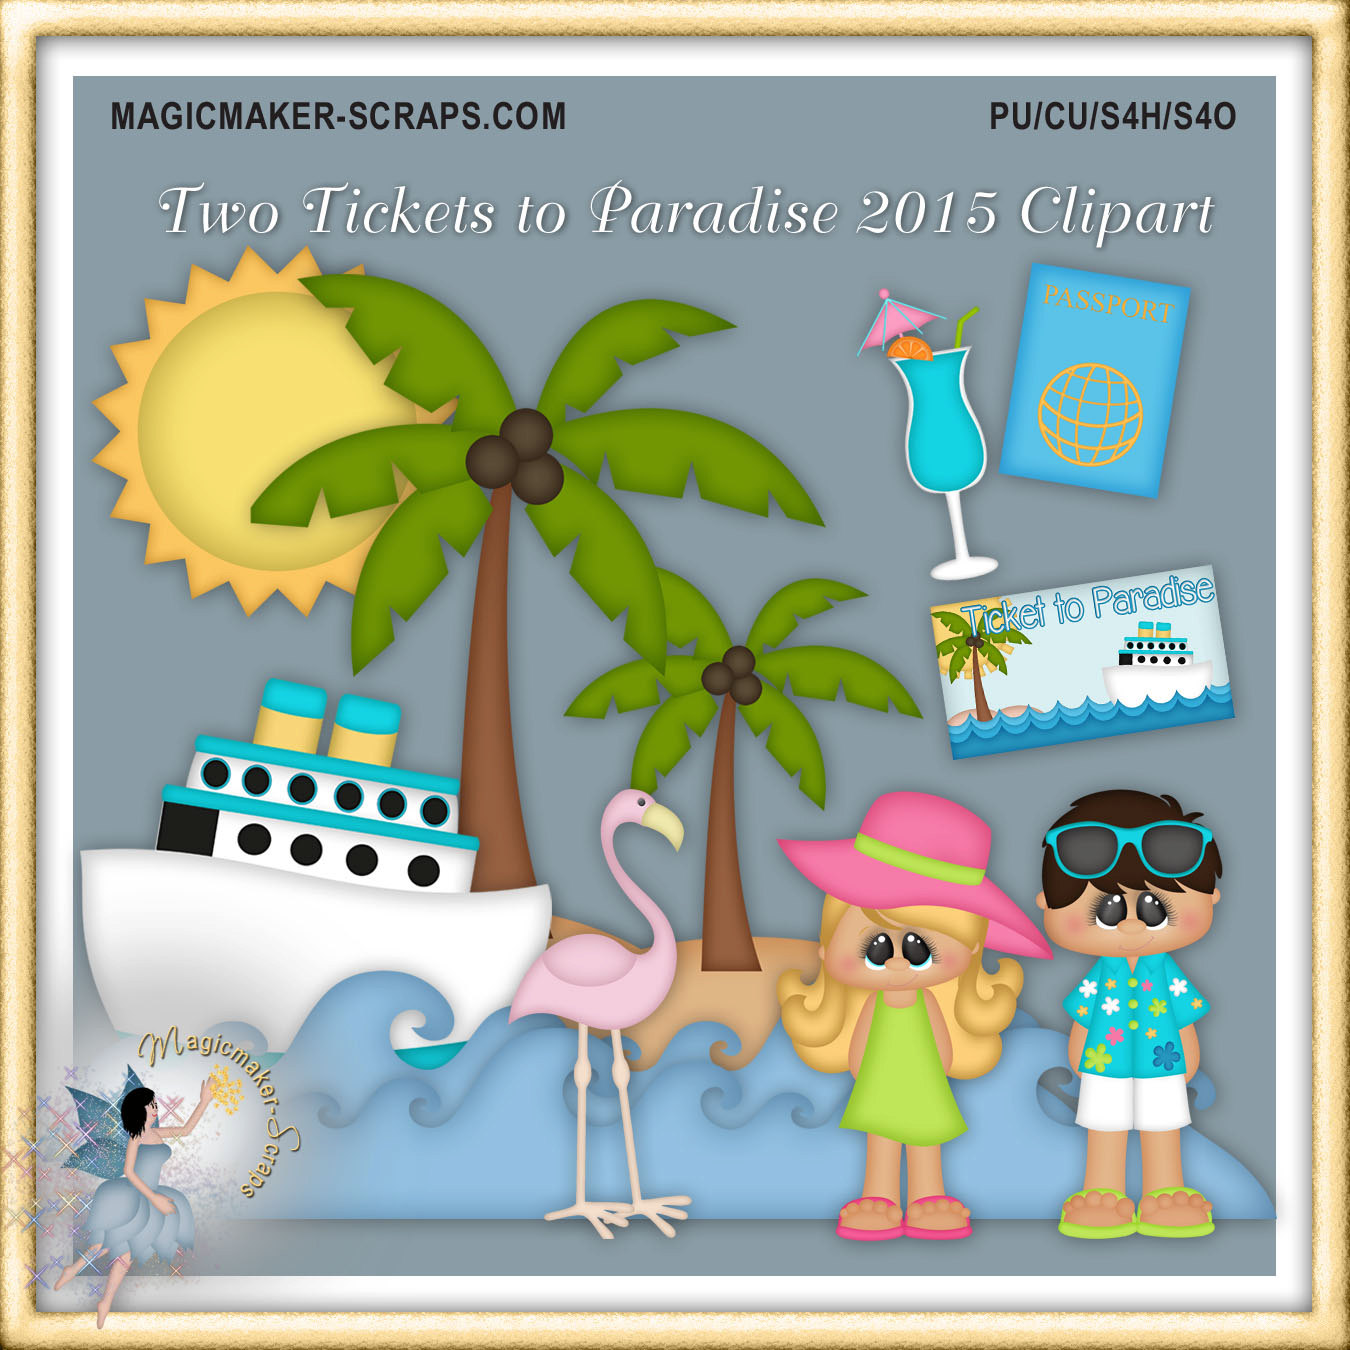 Vacation clipart paradise Paradise digital Caribbean Two Vacation